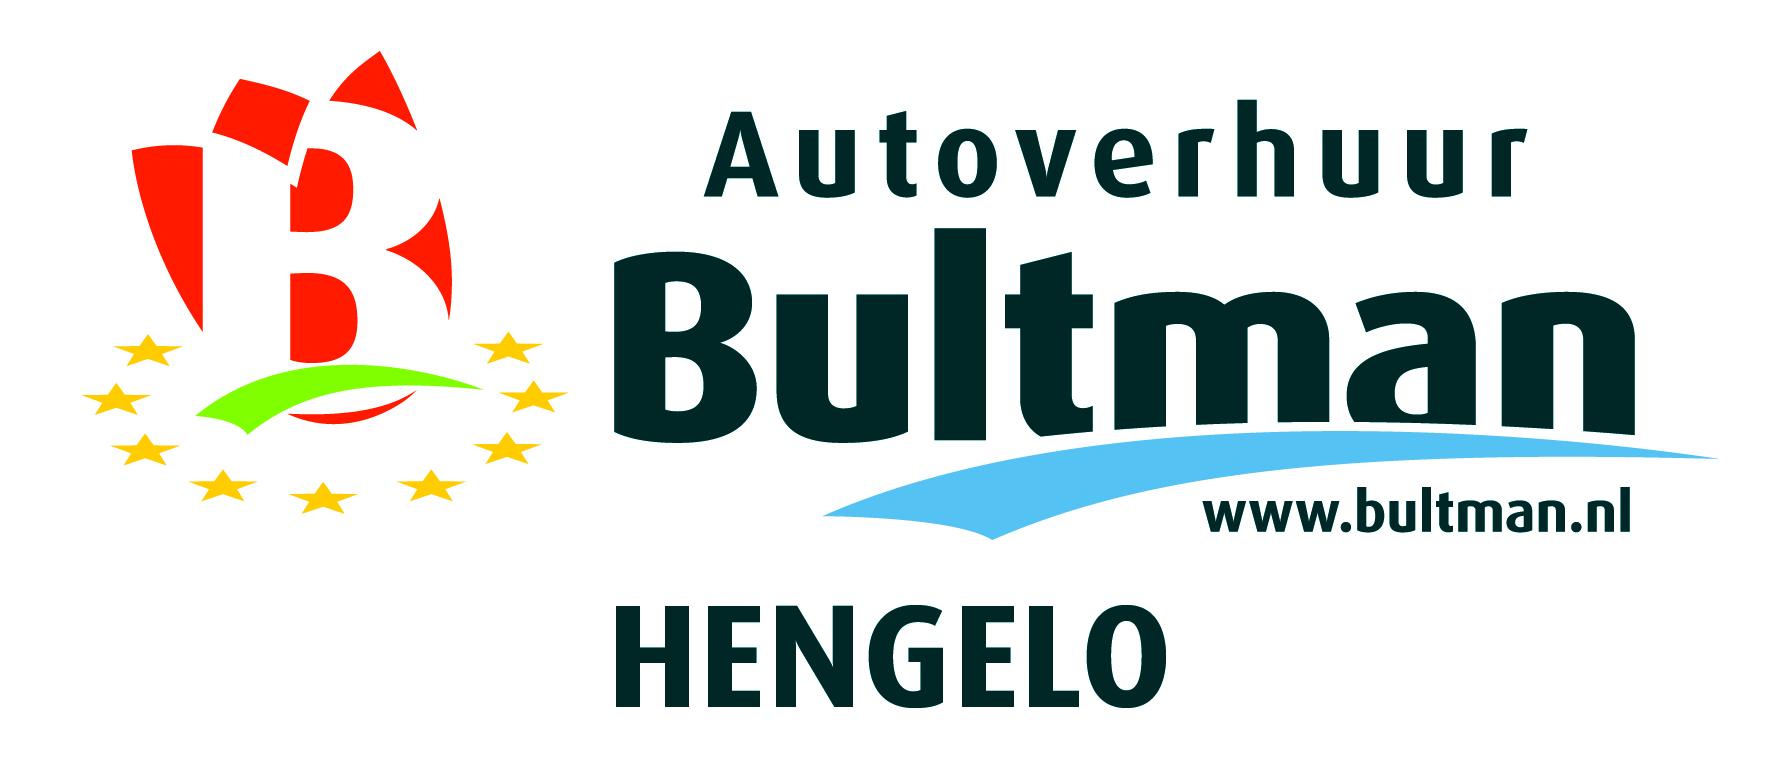 6872-17 Bultman logo Hengelo